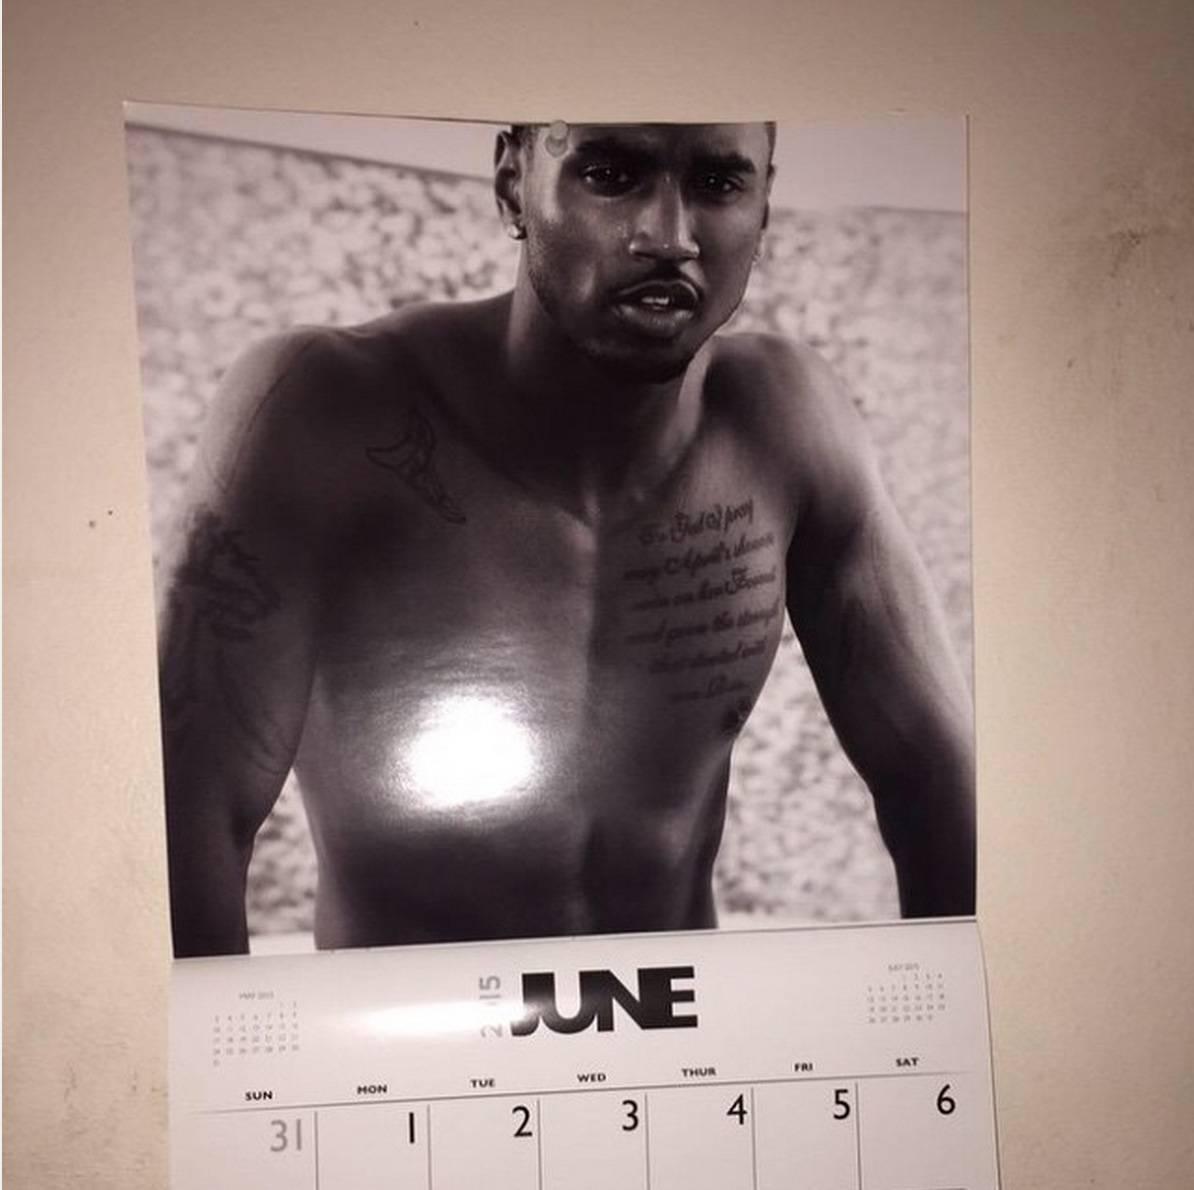 A Calendar? - Say it isn't so!(Photo: Trey Songz via Instagram)